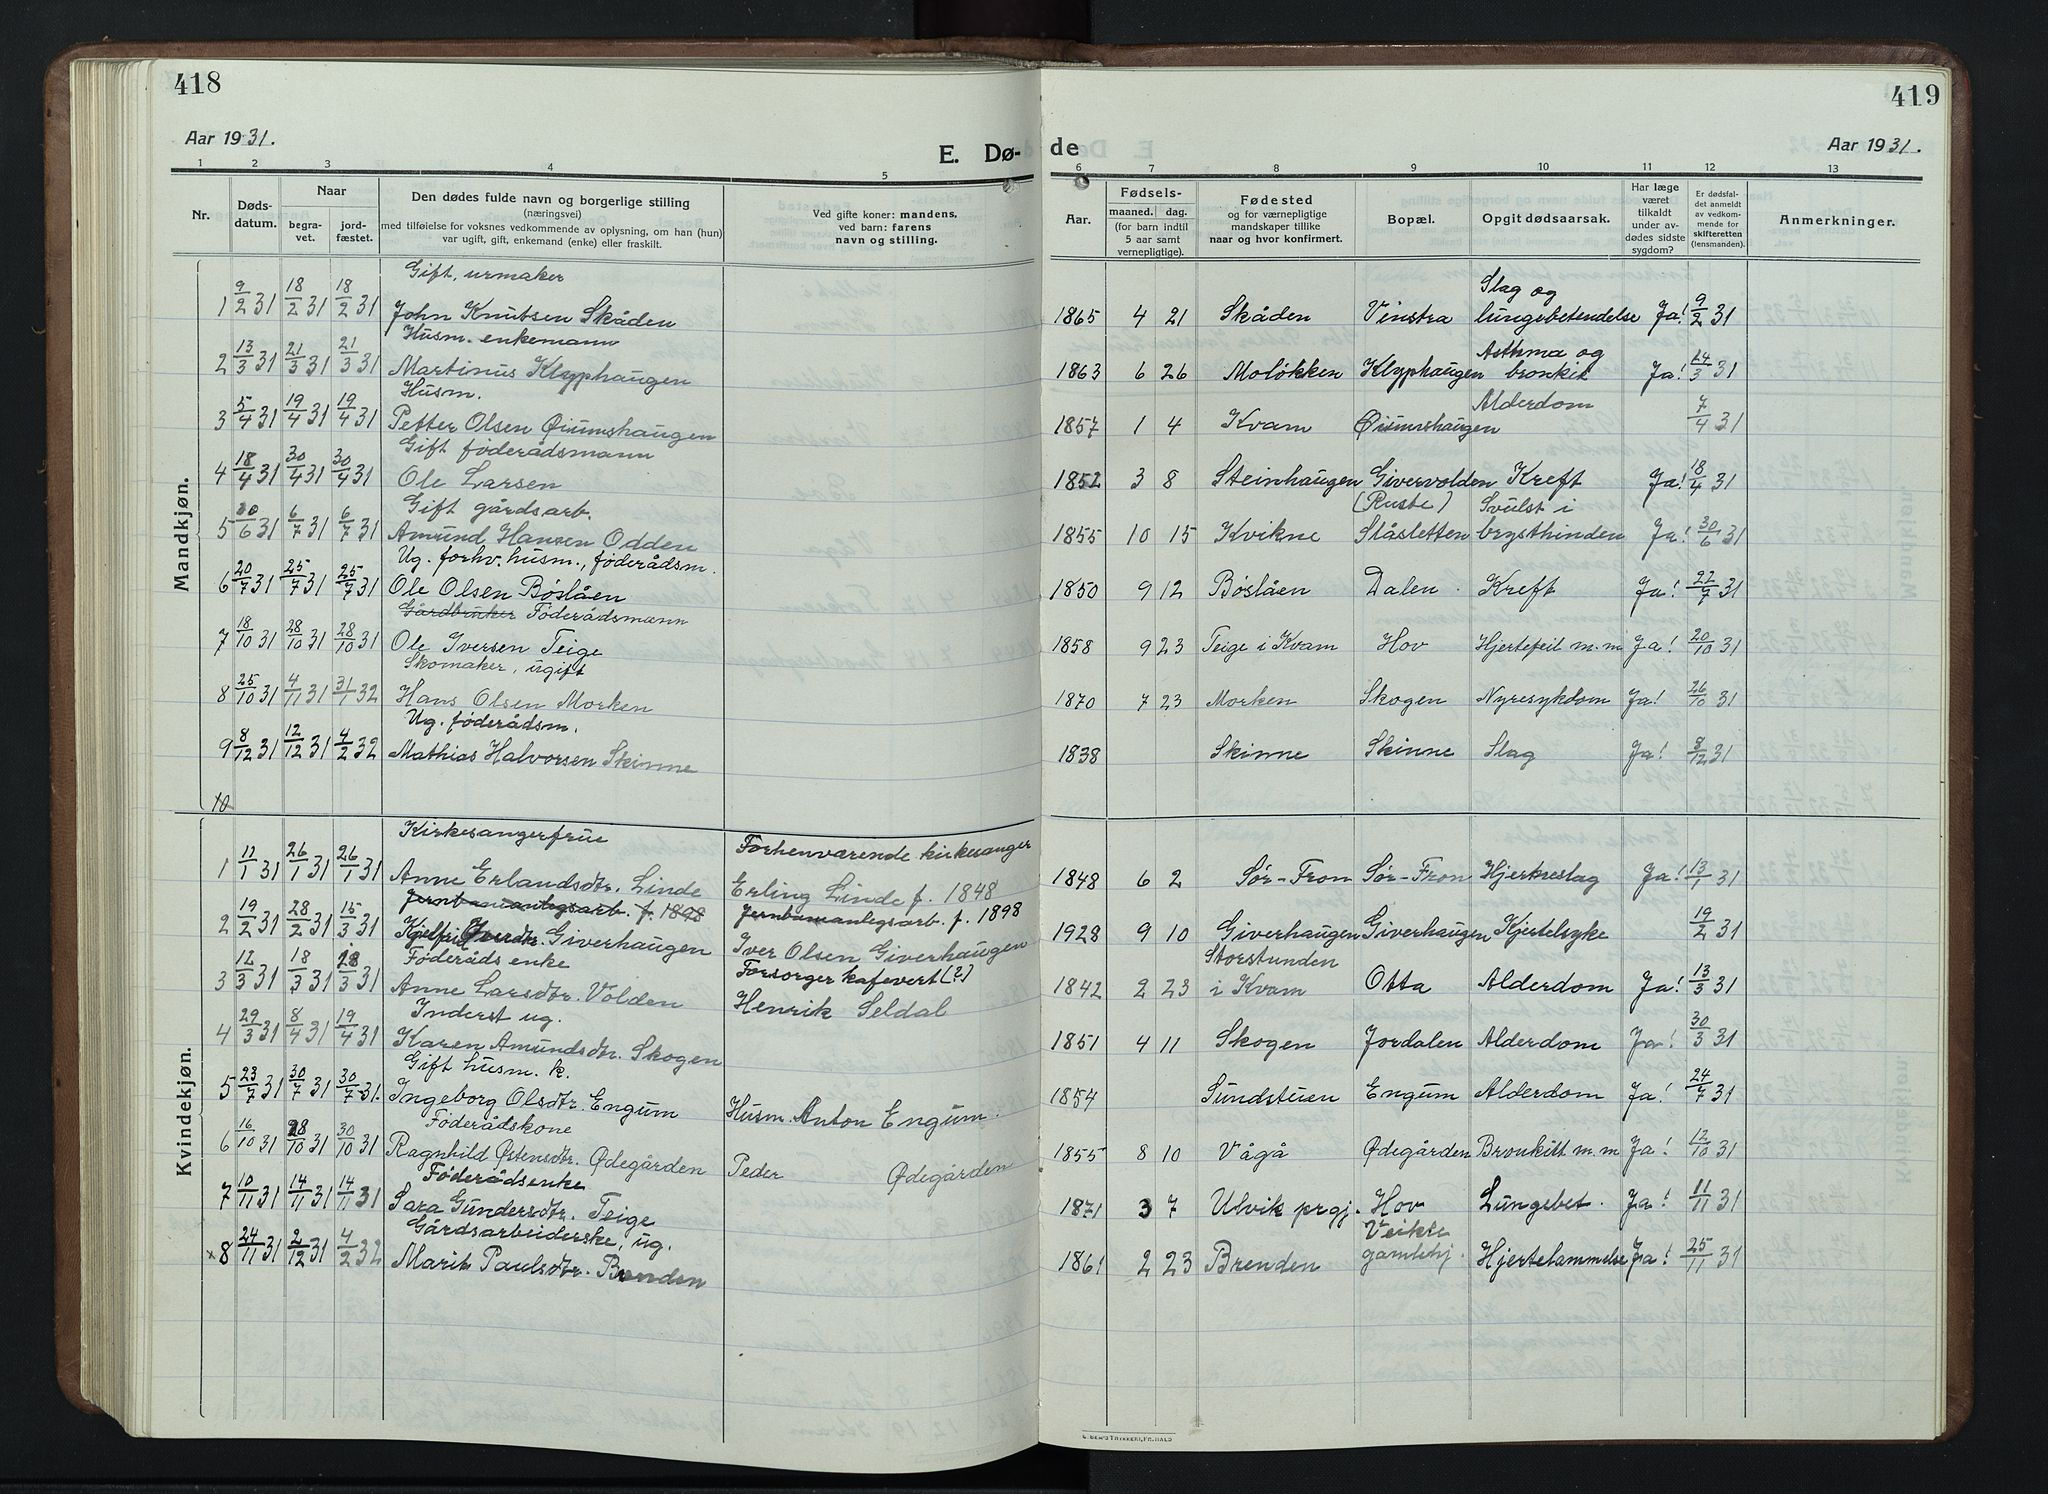 SAH, Nord-Fron prestekontor, Klokkerbok nr. 7, 1915-1946, s. 418-419